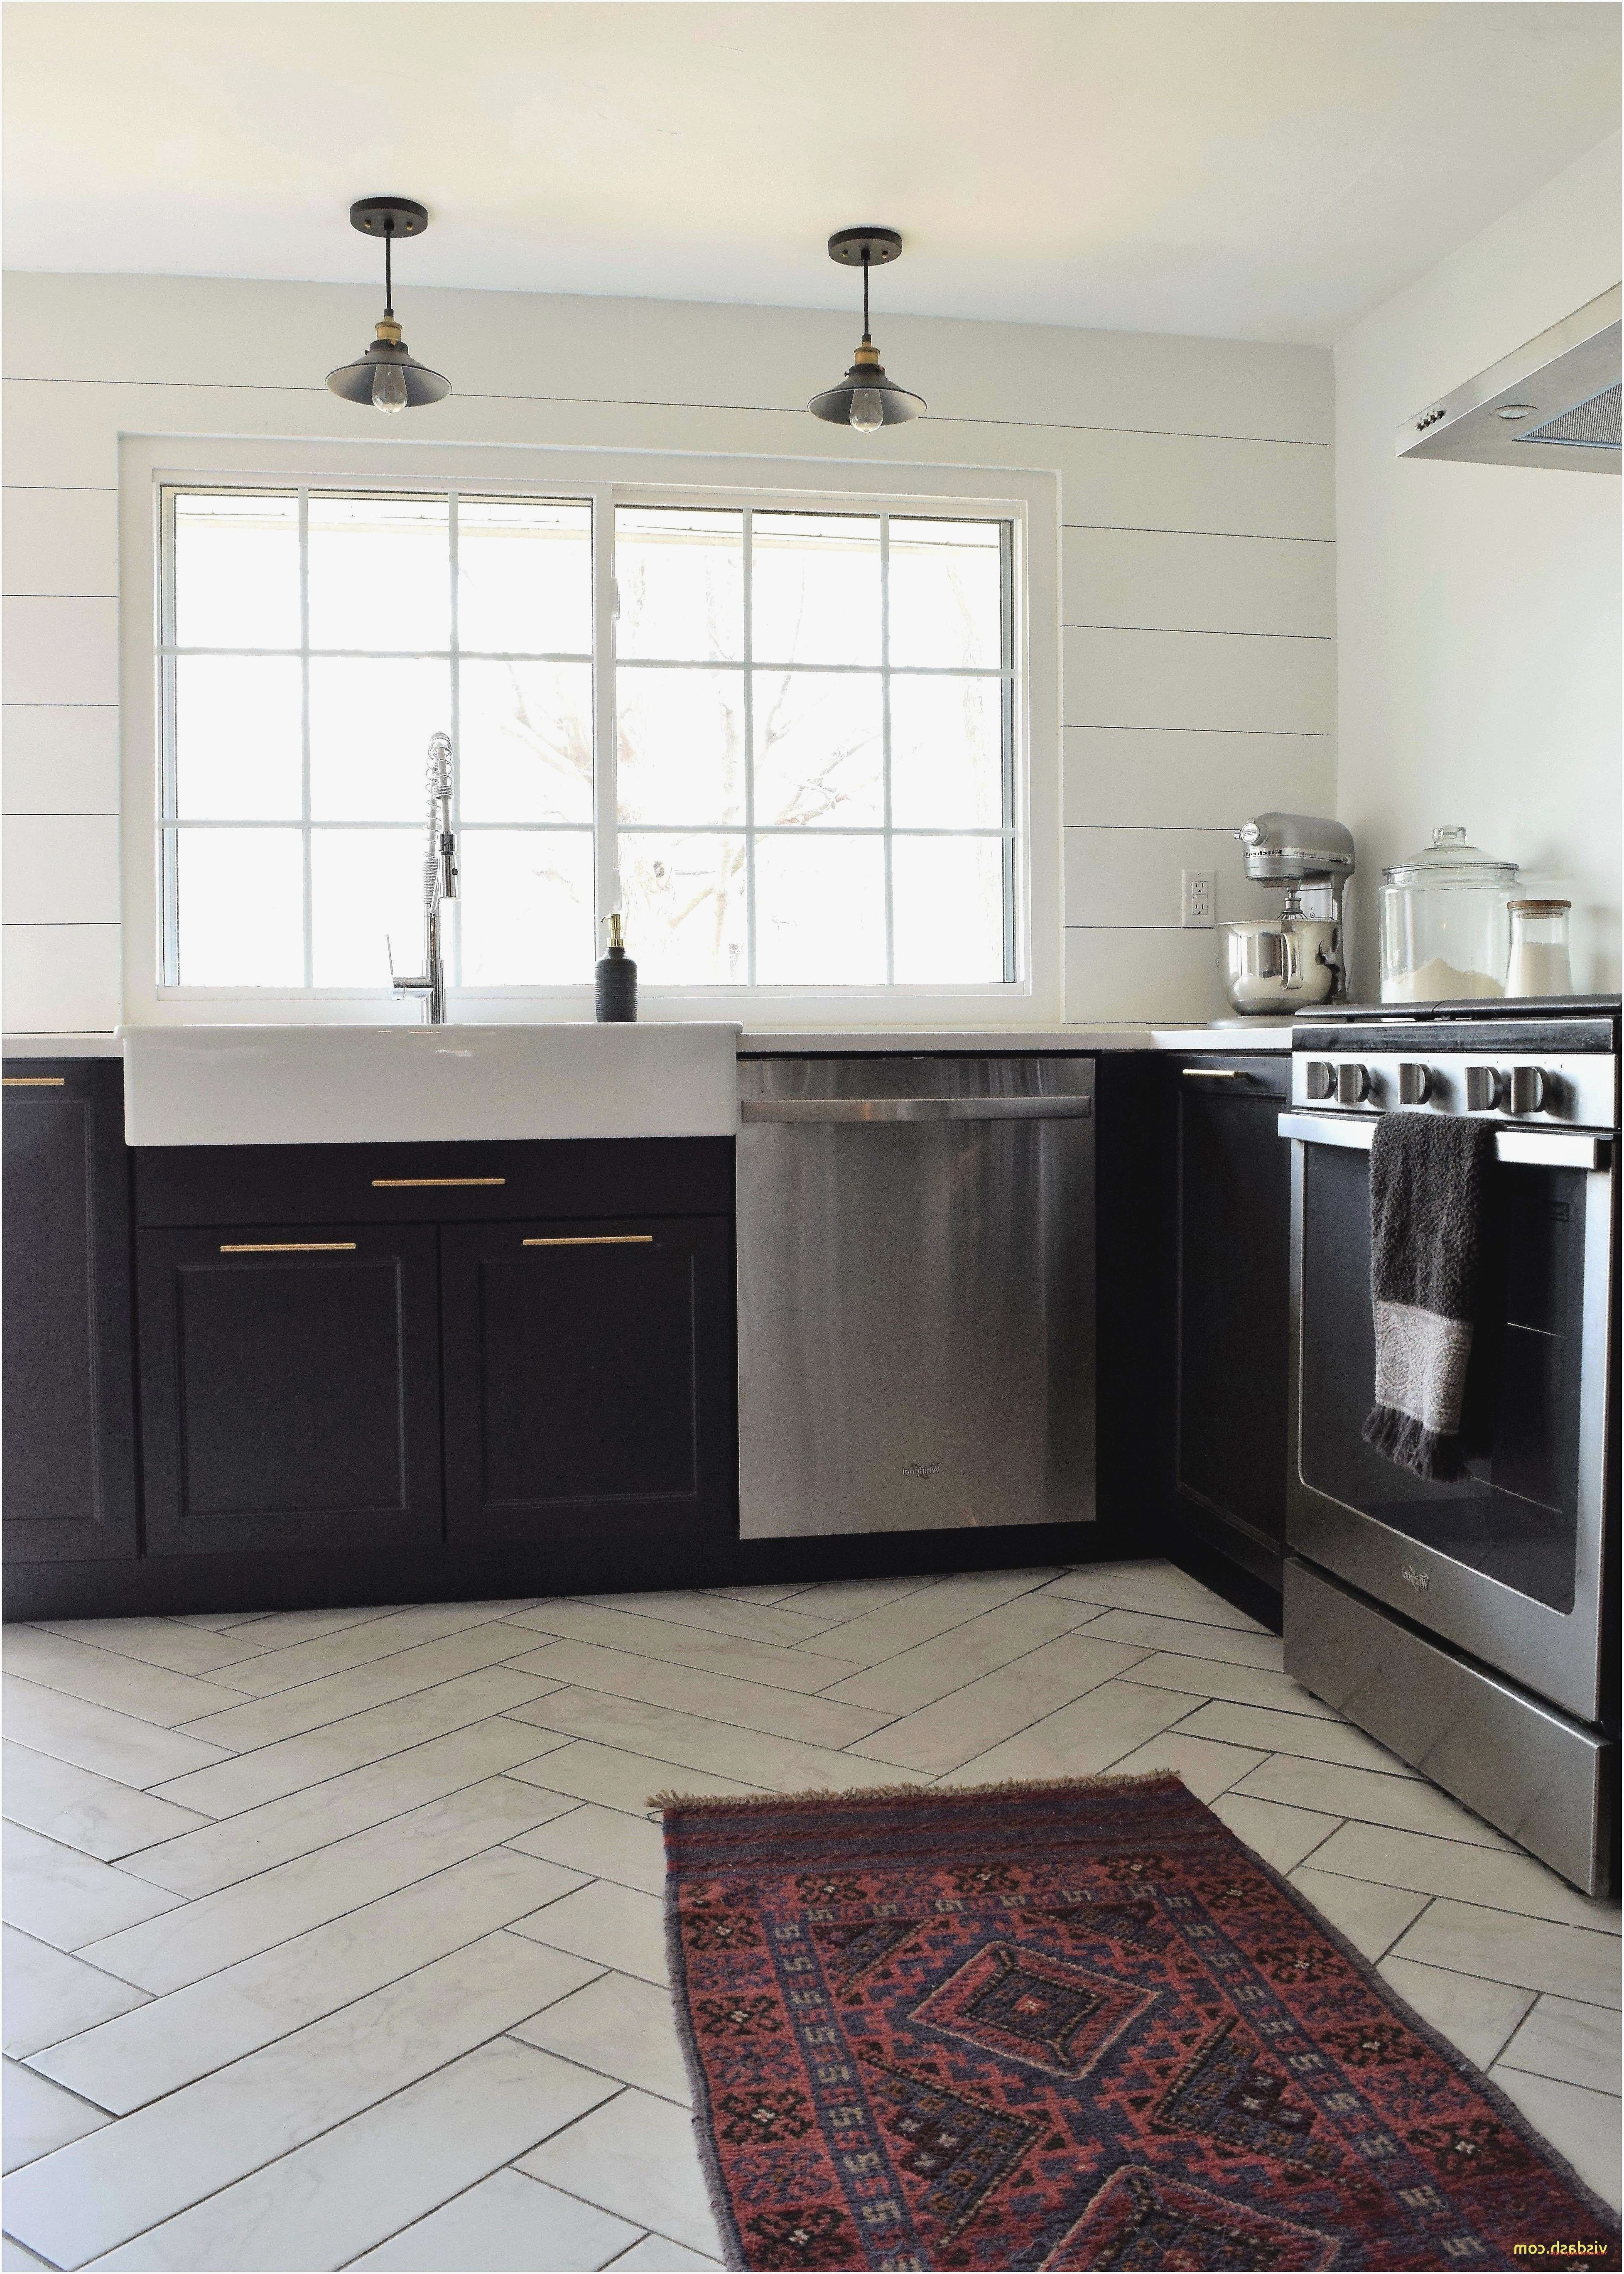 create kitchen layout kitchen design pics new kitchen remodel 0d design kitchen remodel s 24 best